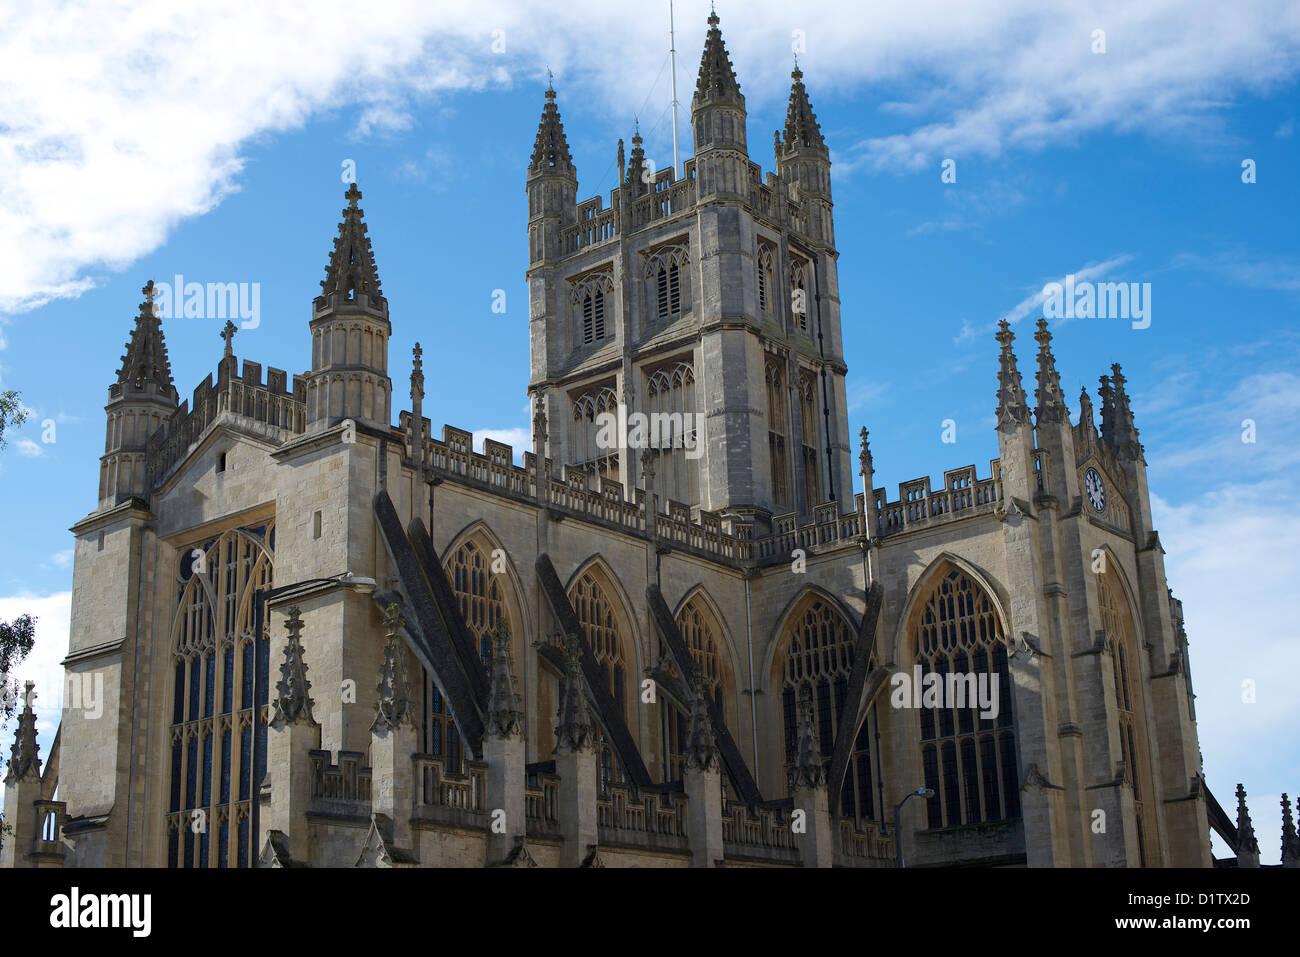 Bath Abbey Stock Photos & Bath Abbey Stock Images - Alamy